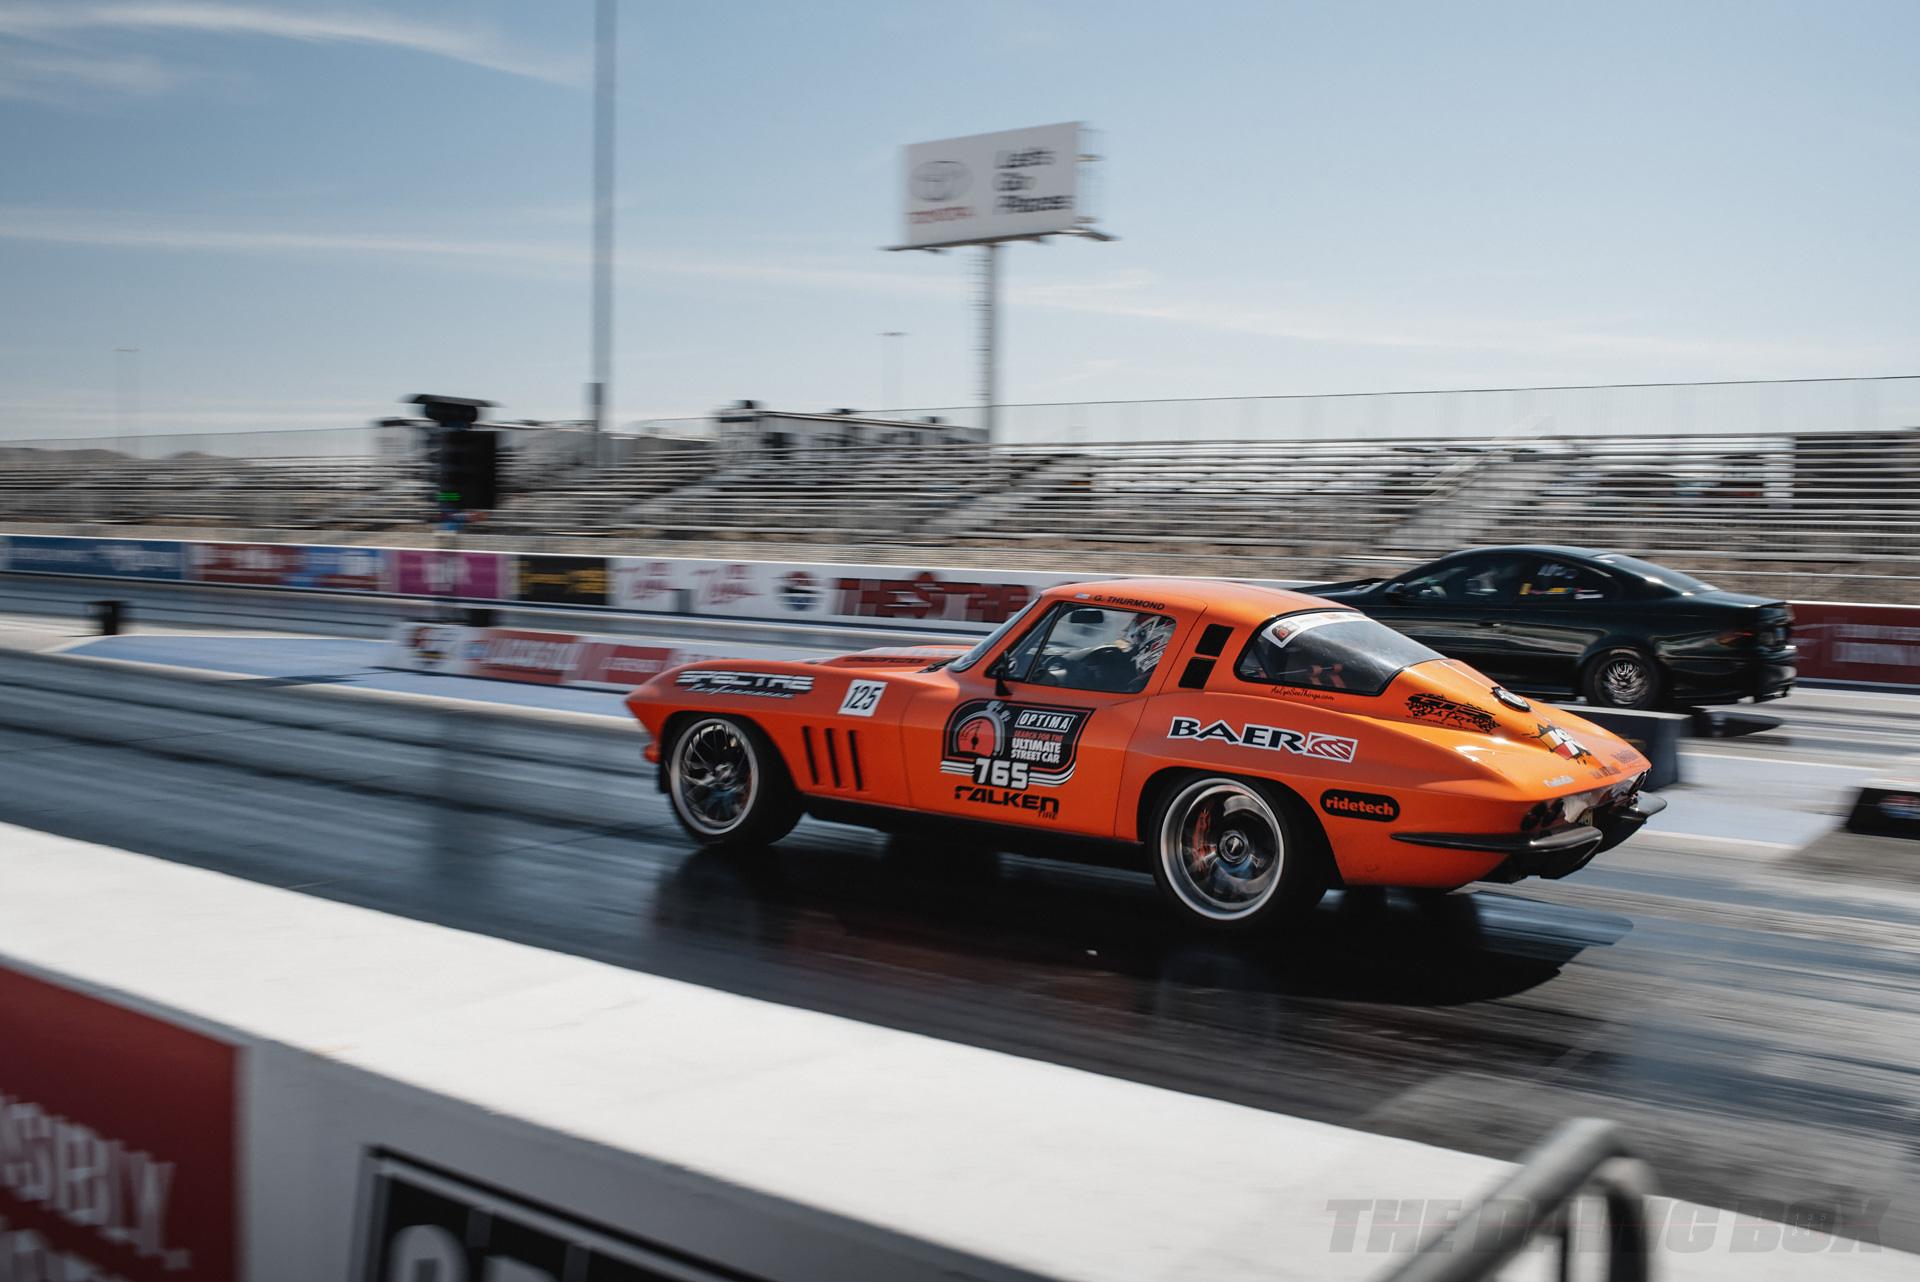 orange Chevy Camaro drag racing against a black BMW